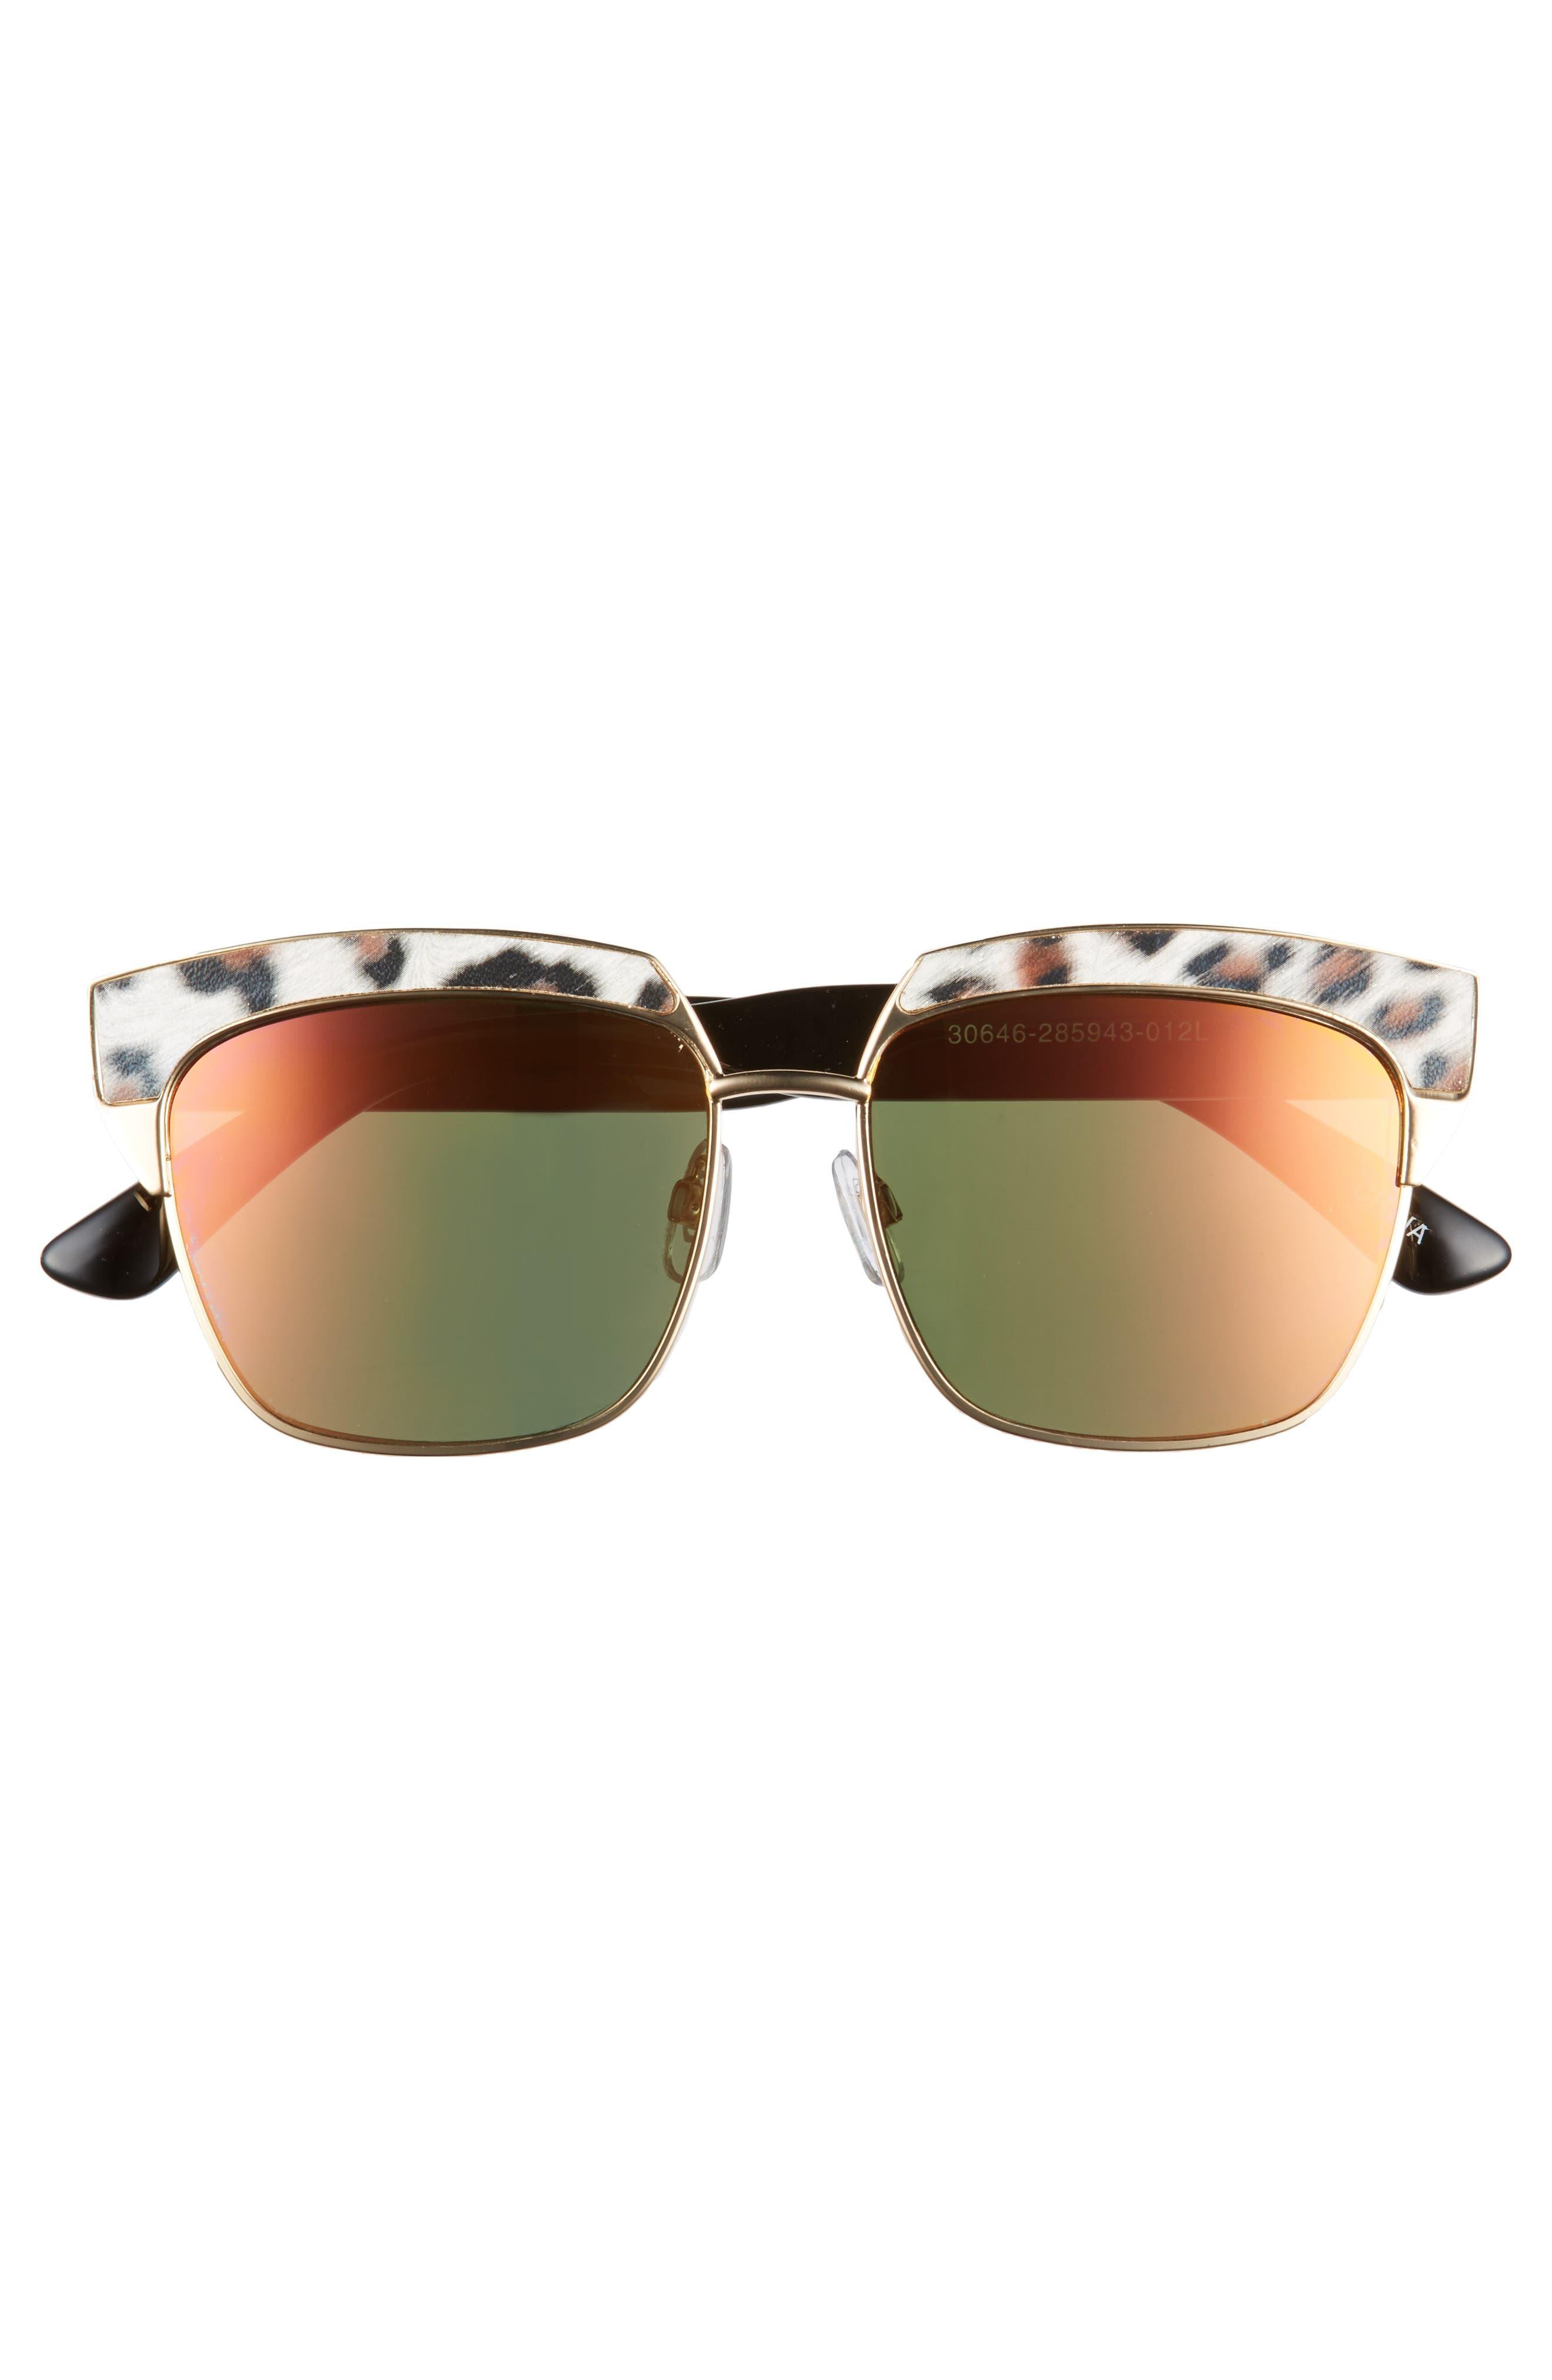 Leopard Print Top Bar Sunglasses,                             Alternate thumbnail 3, color,                             710